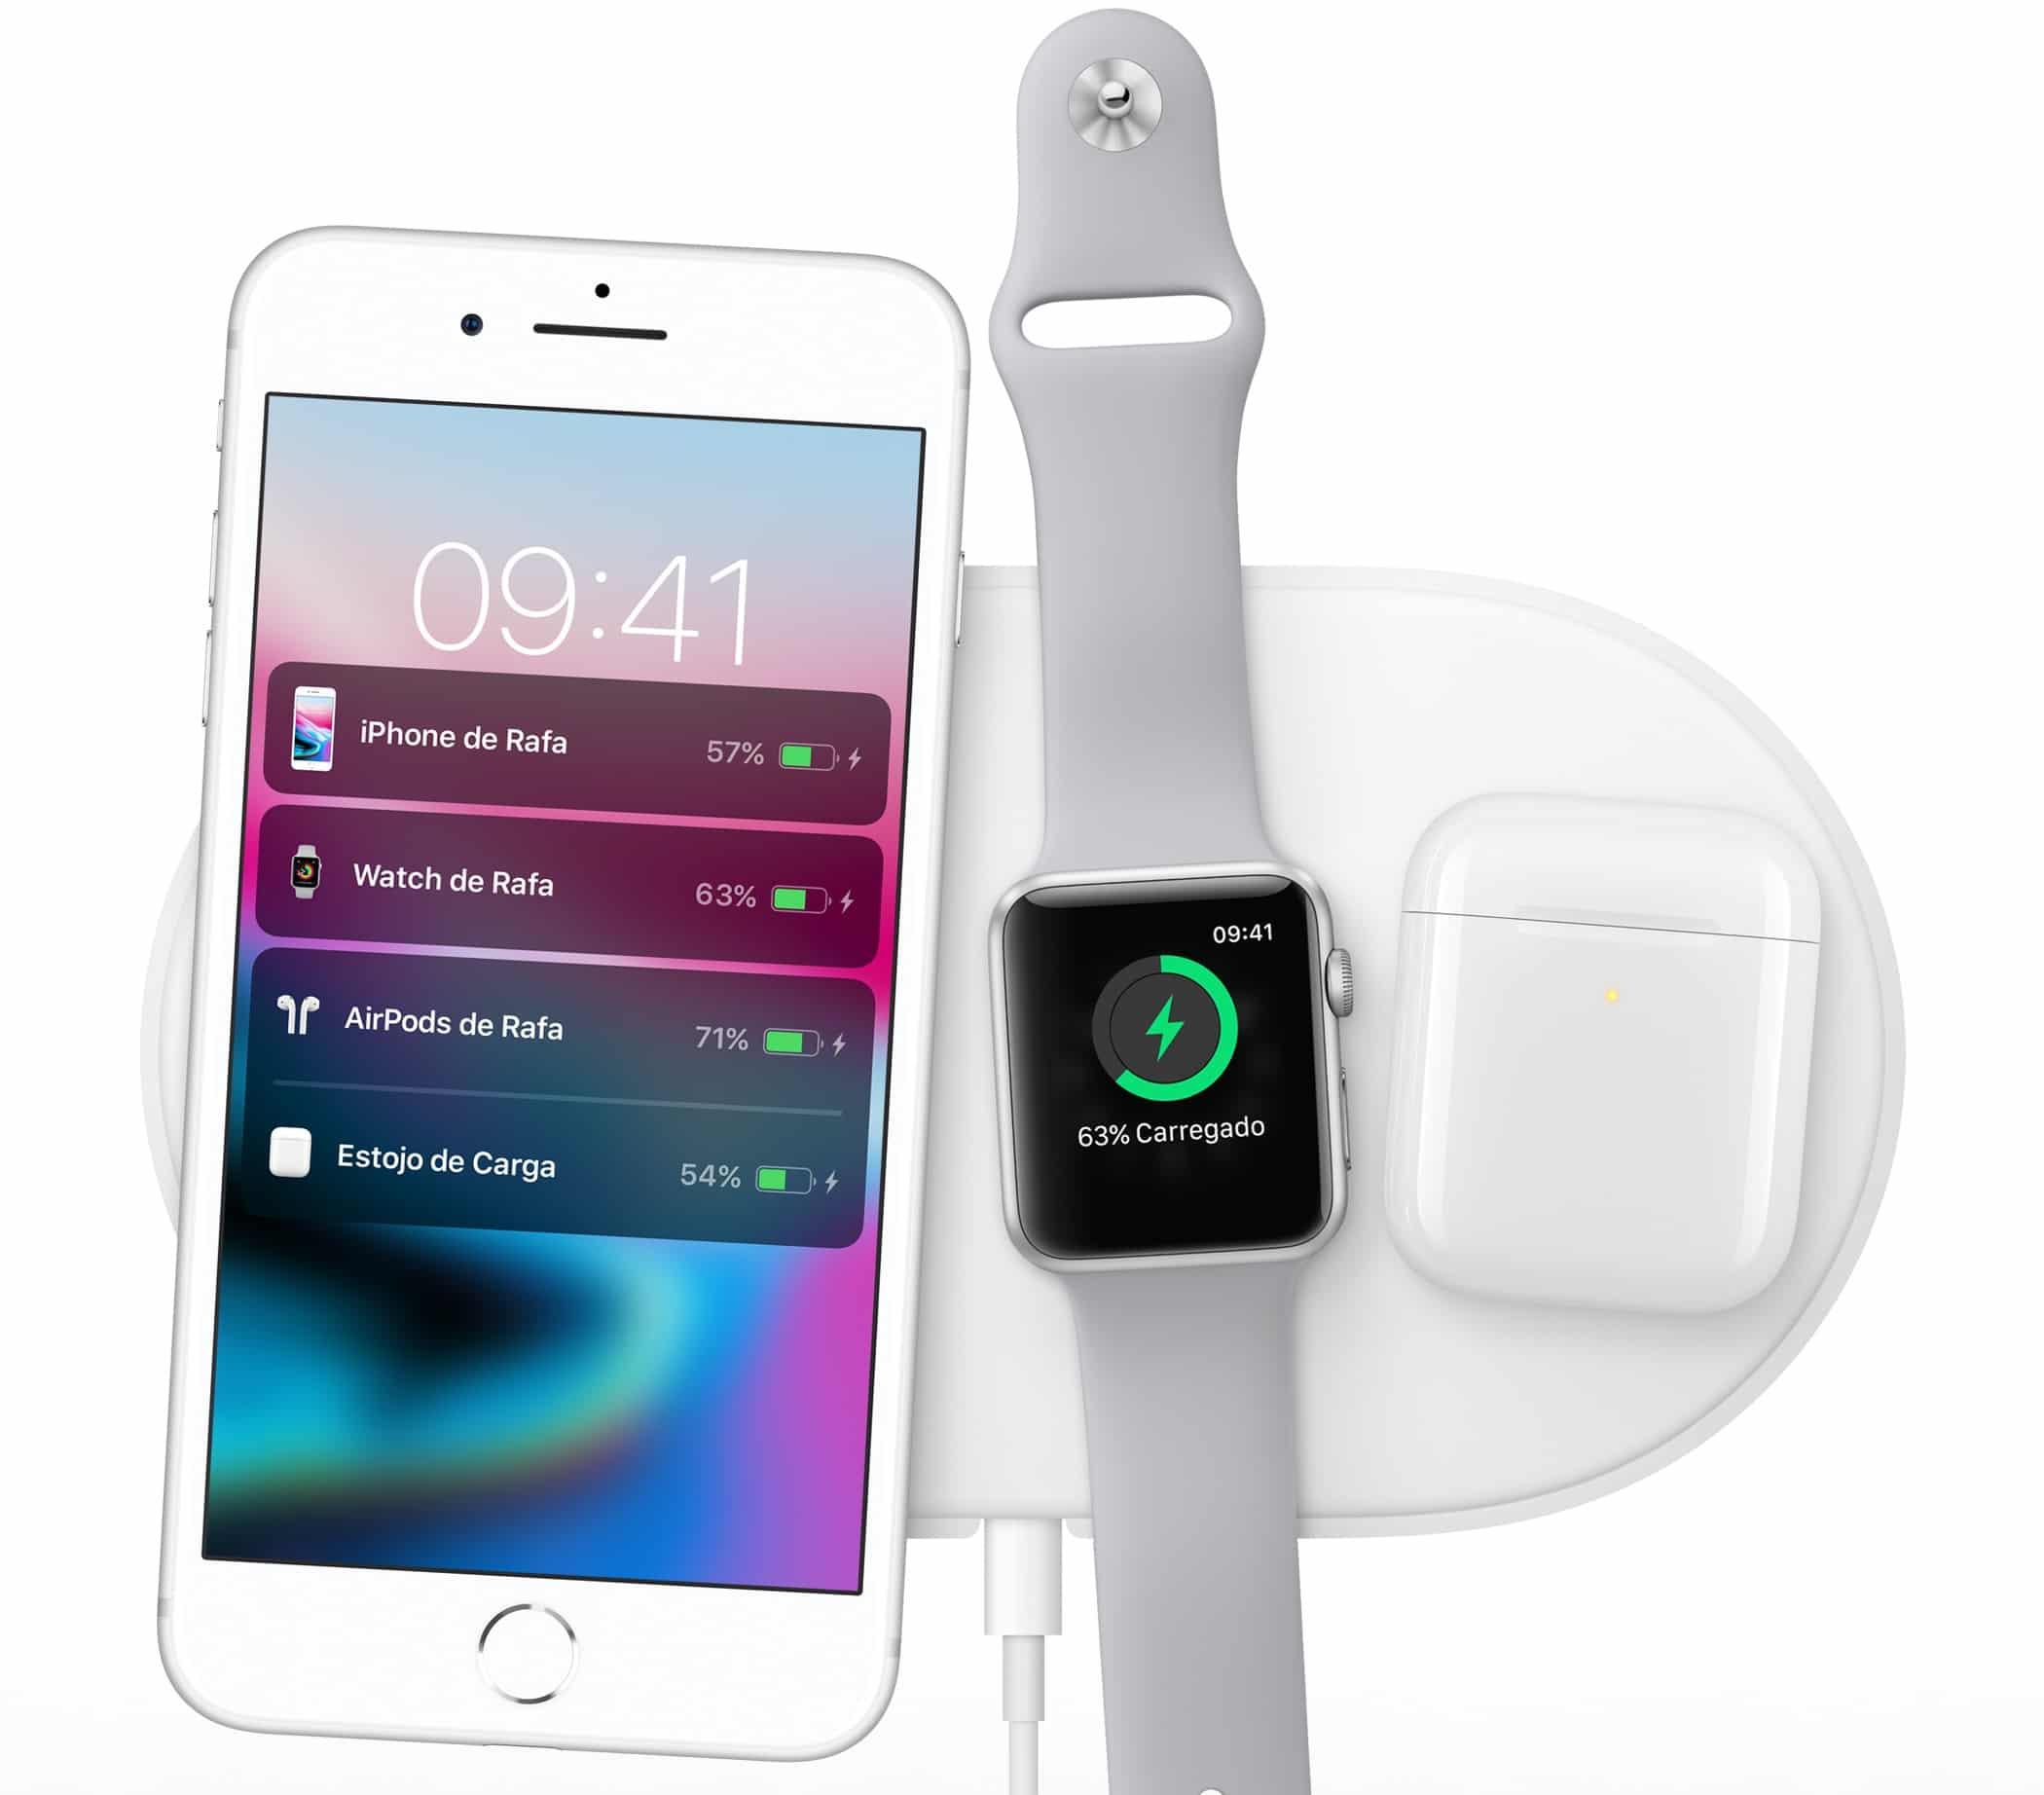 Base de recarga AirPower com iPhone 8 Plus, o Apple Watch Series 3 e o AirPods